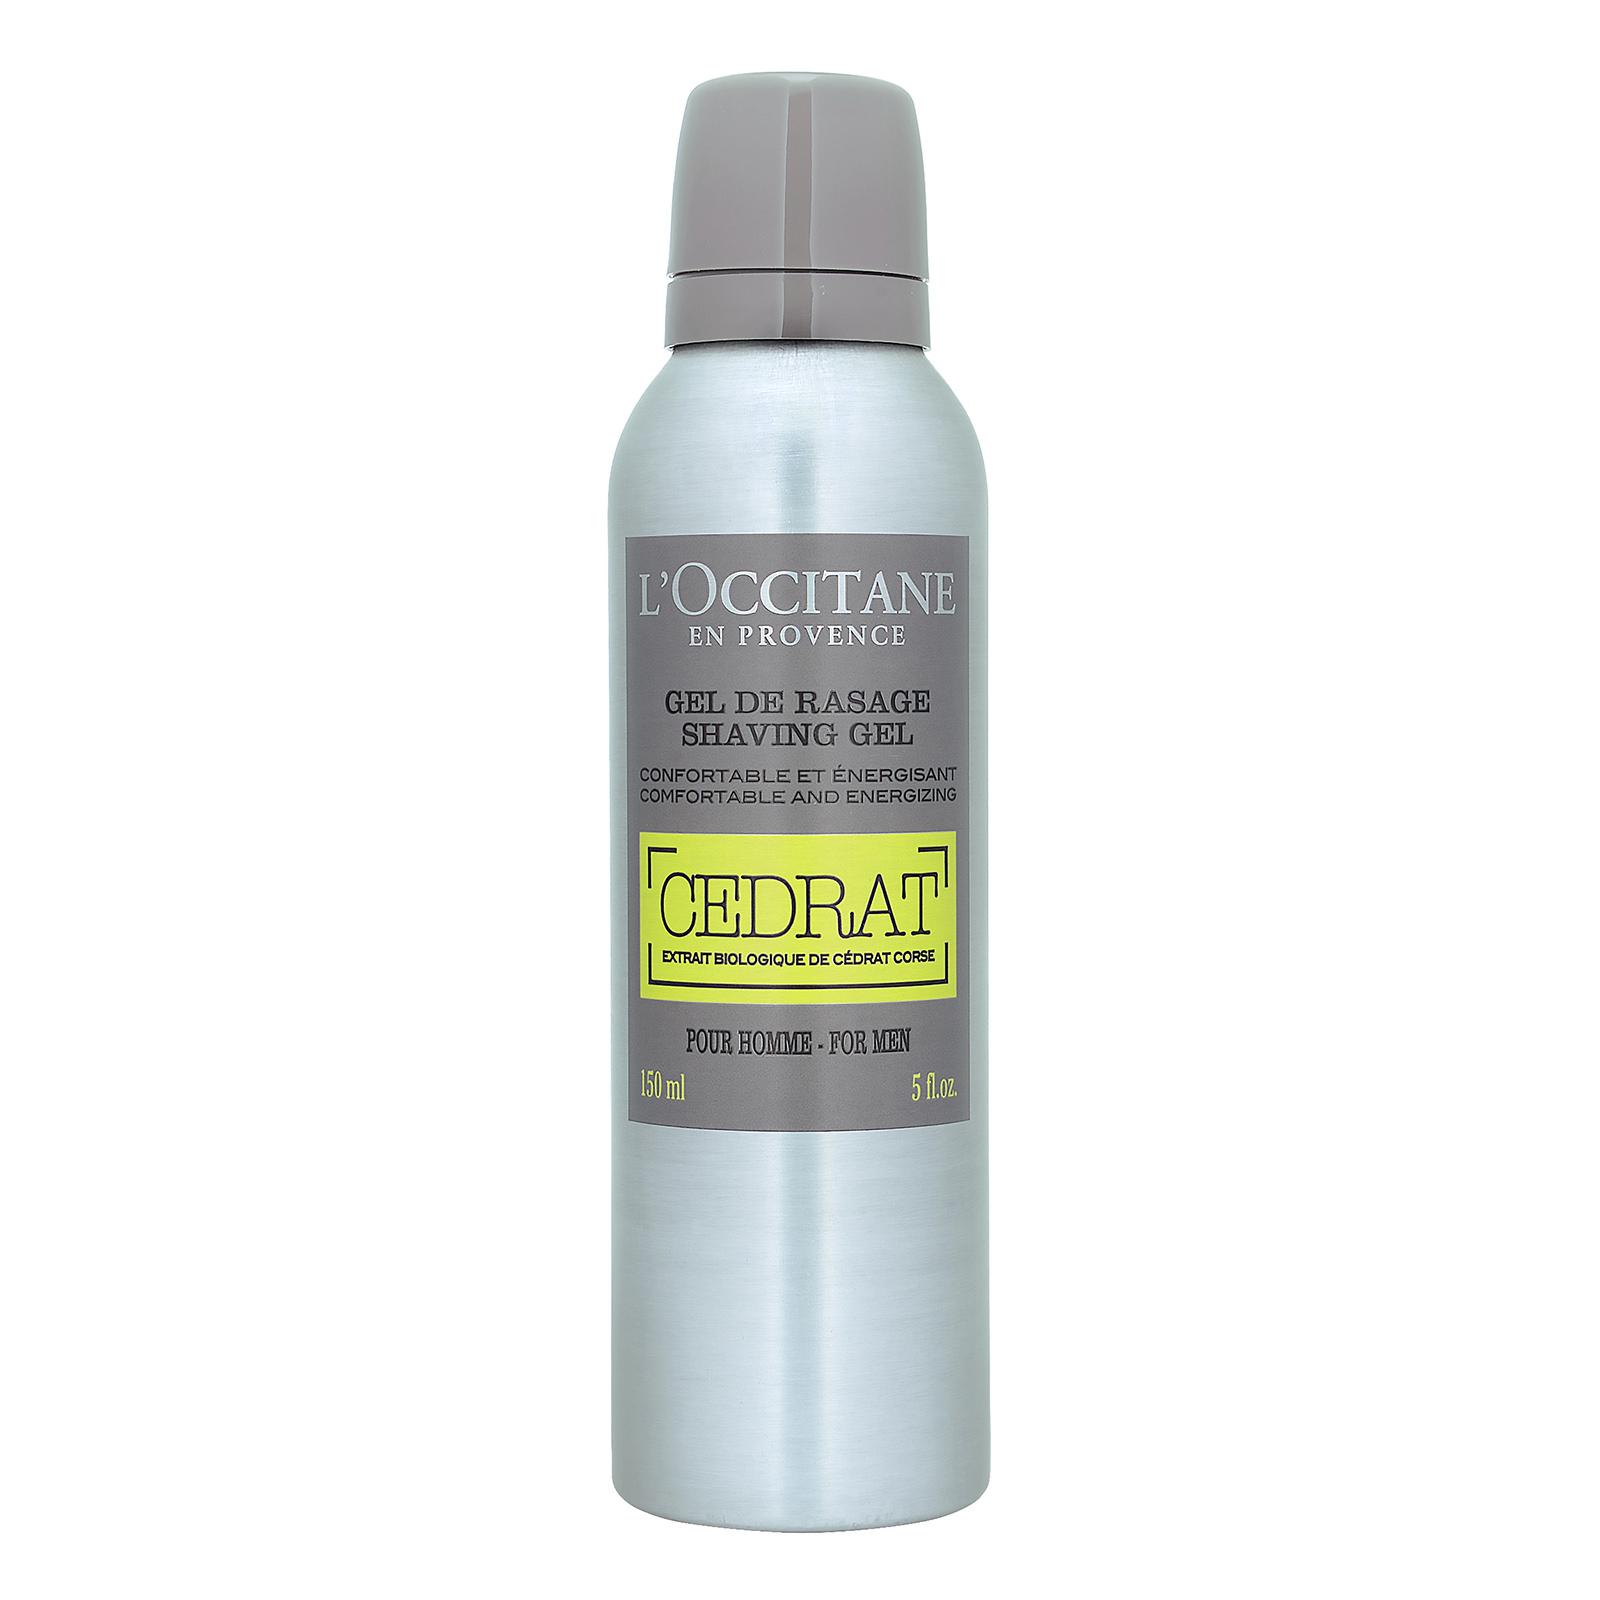 L'Occitane Cedrat Shaving Gel 5oz, 150ml LOX0100668-000-00